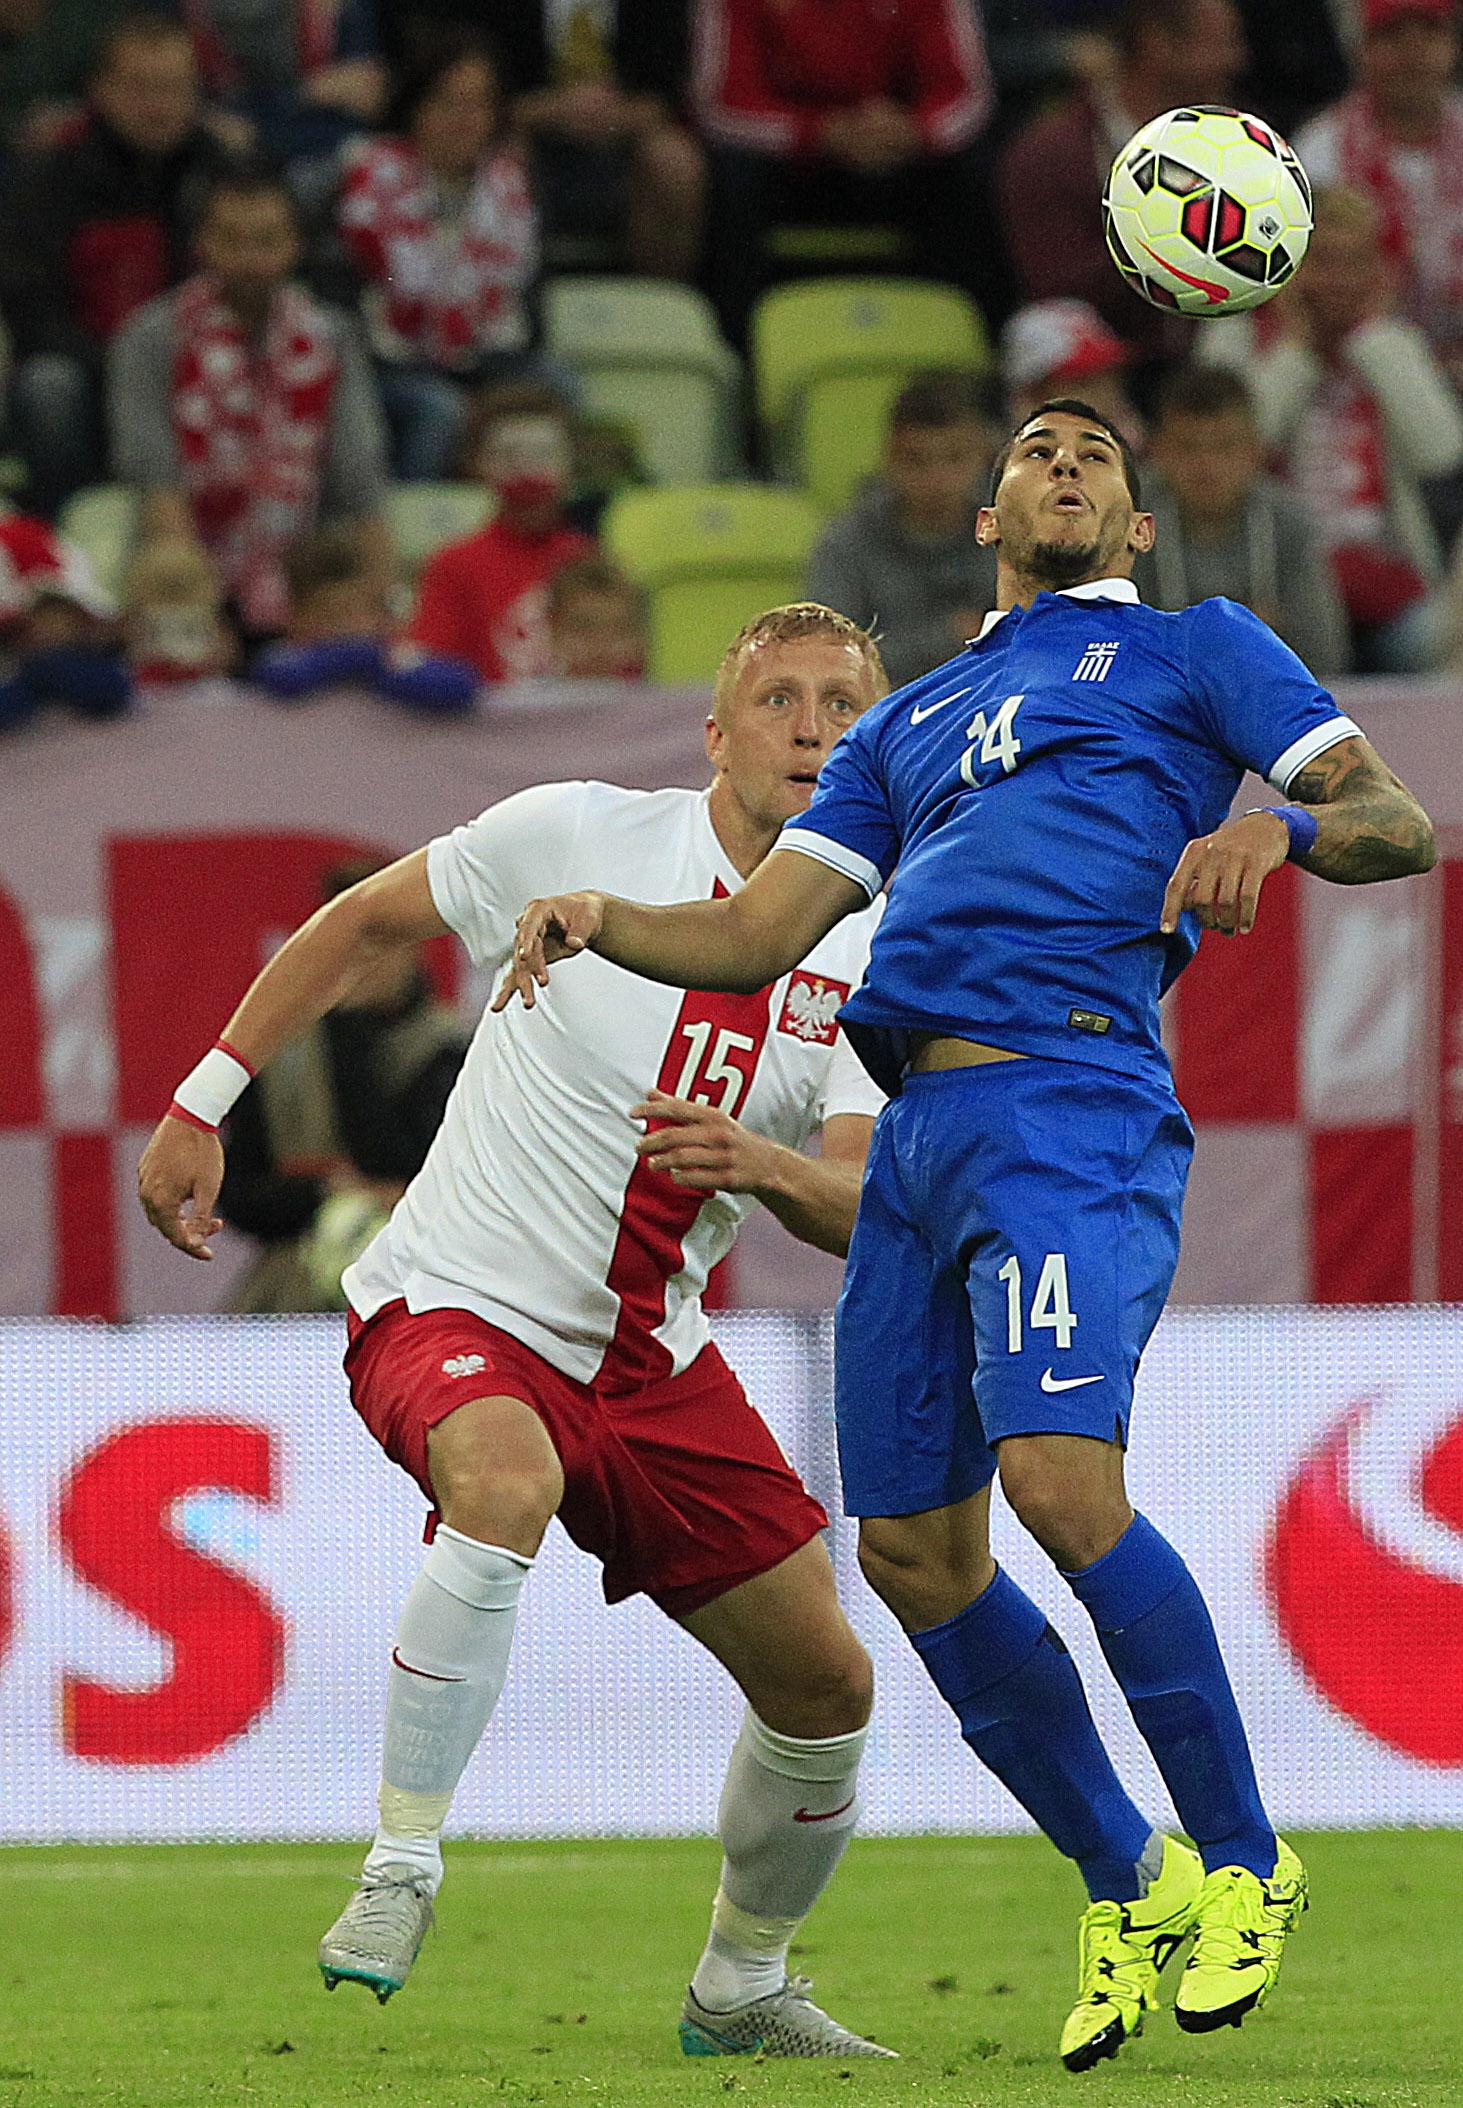 poland_greece_soccer-eafde26a256d4701a58_r5794.jpeg